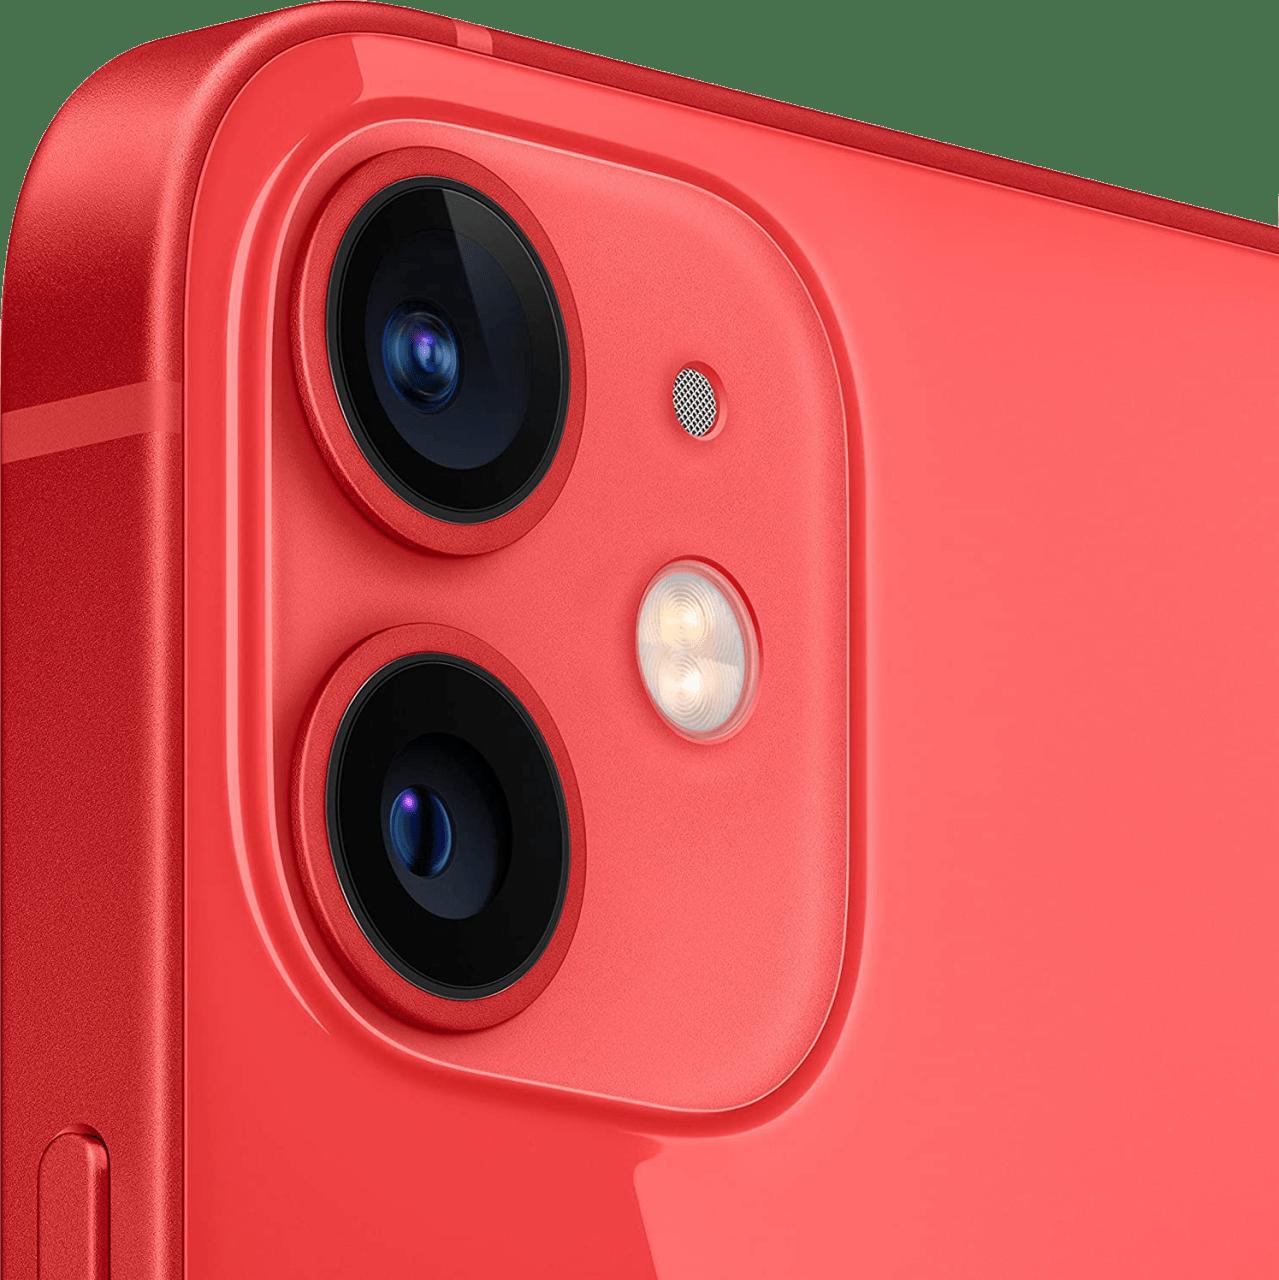 (Product)Red Apple iPhone 12 mini 128GB.4